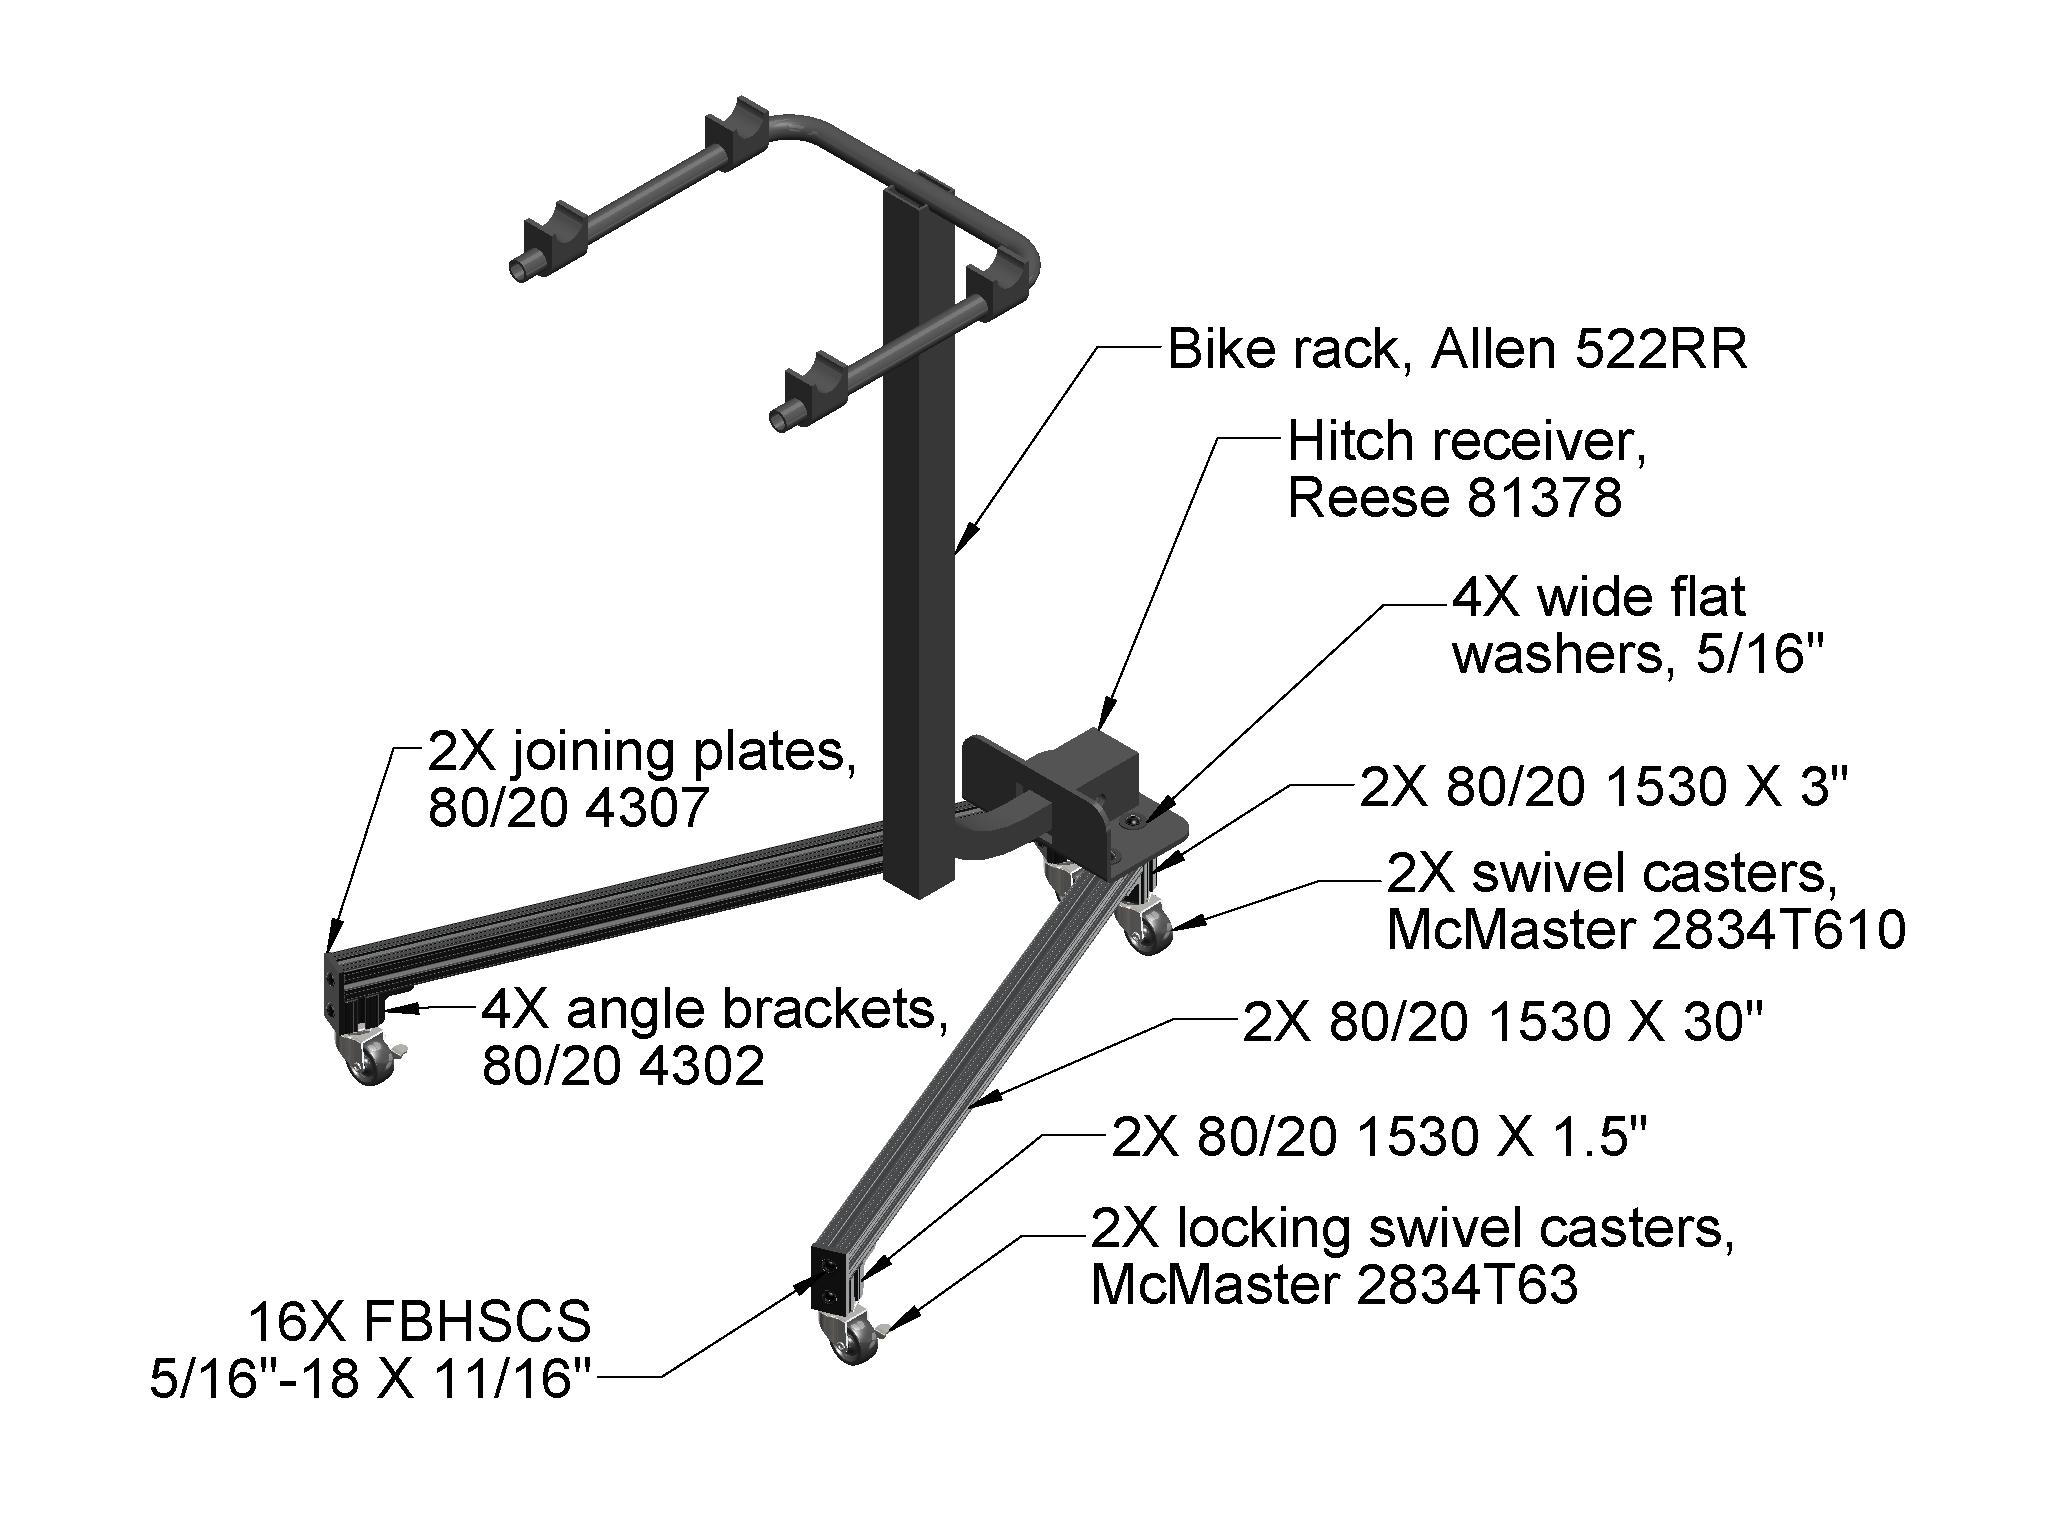 Mini Project Hitch Receiver Bike Rack Stand